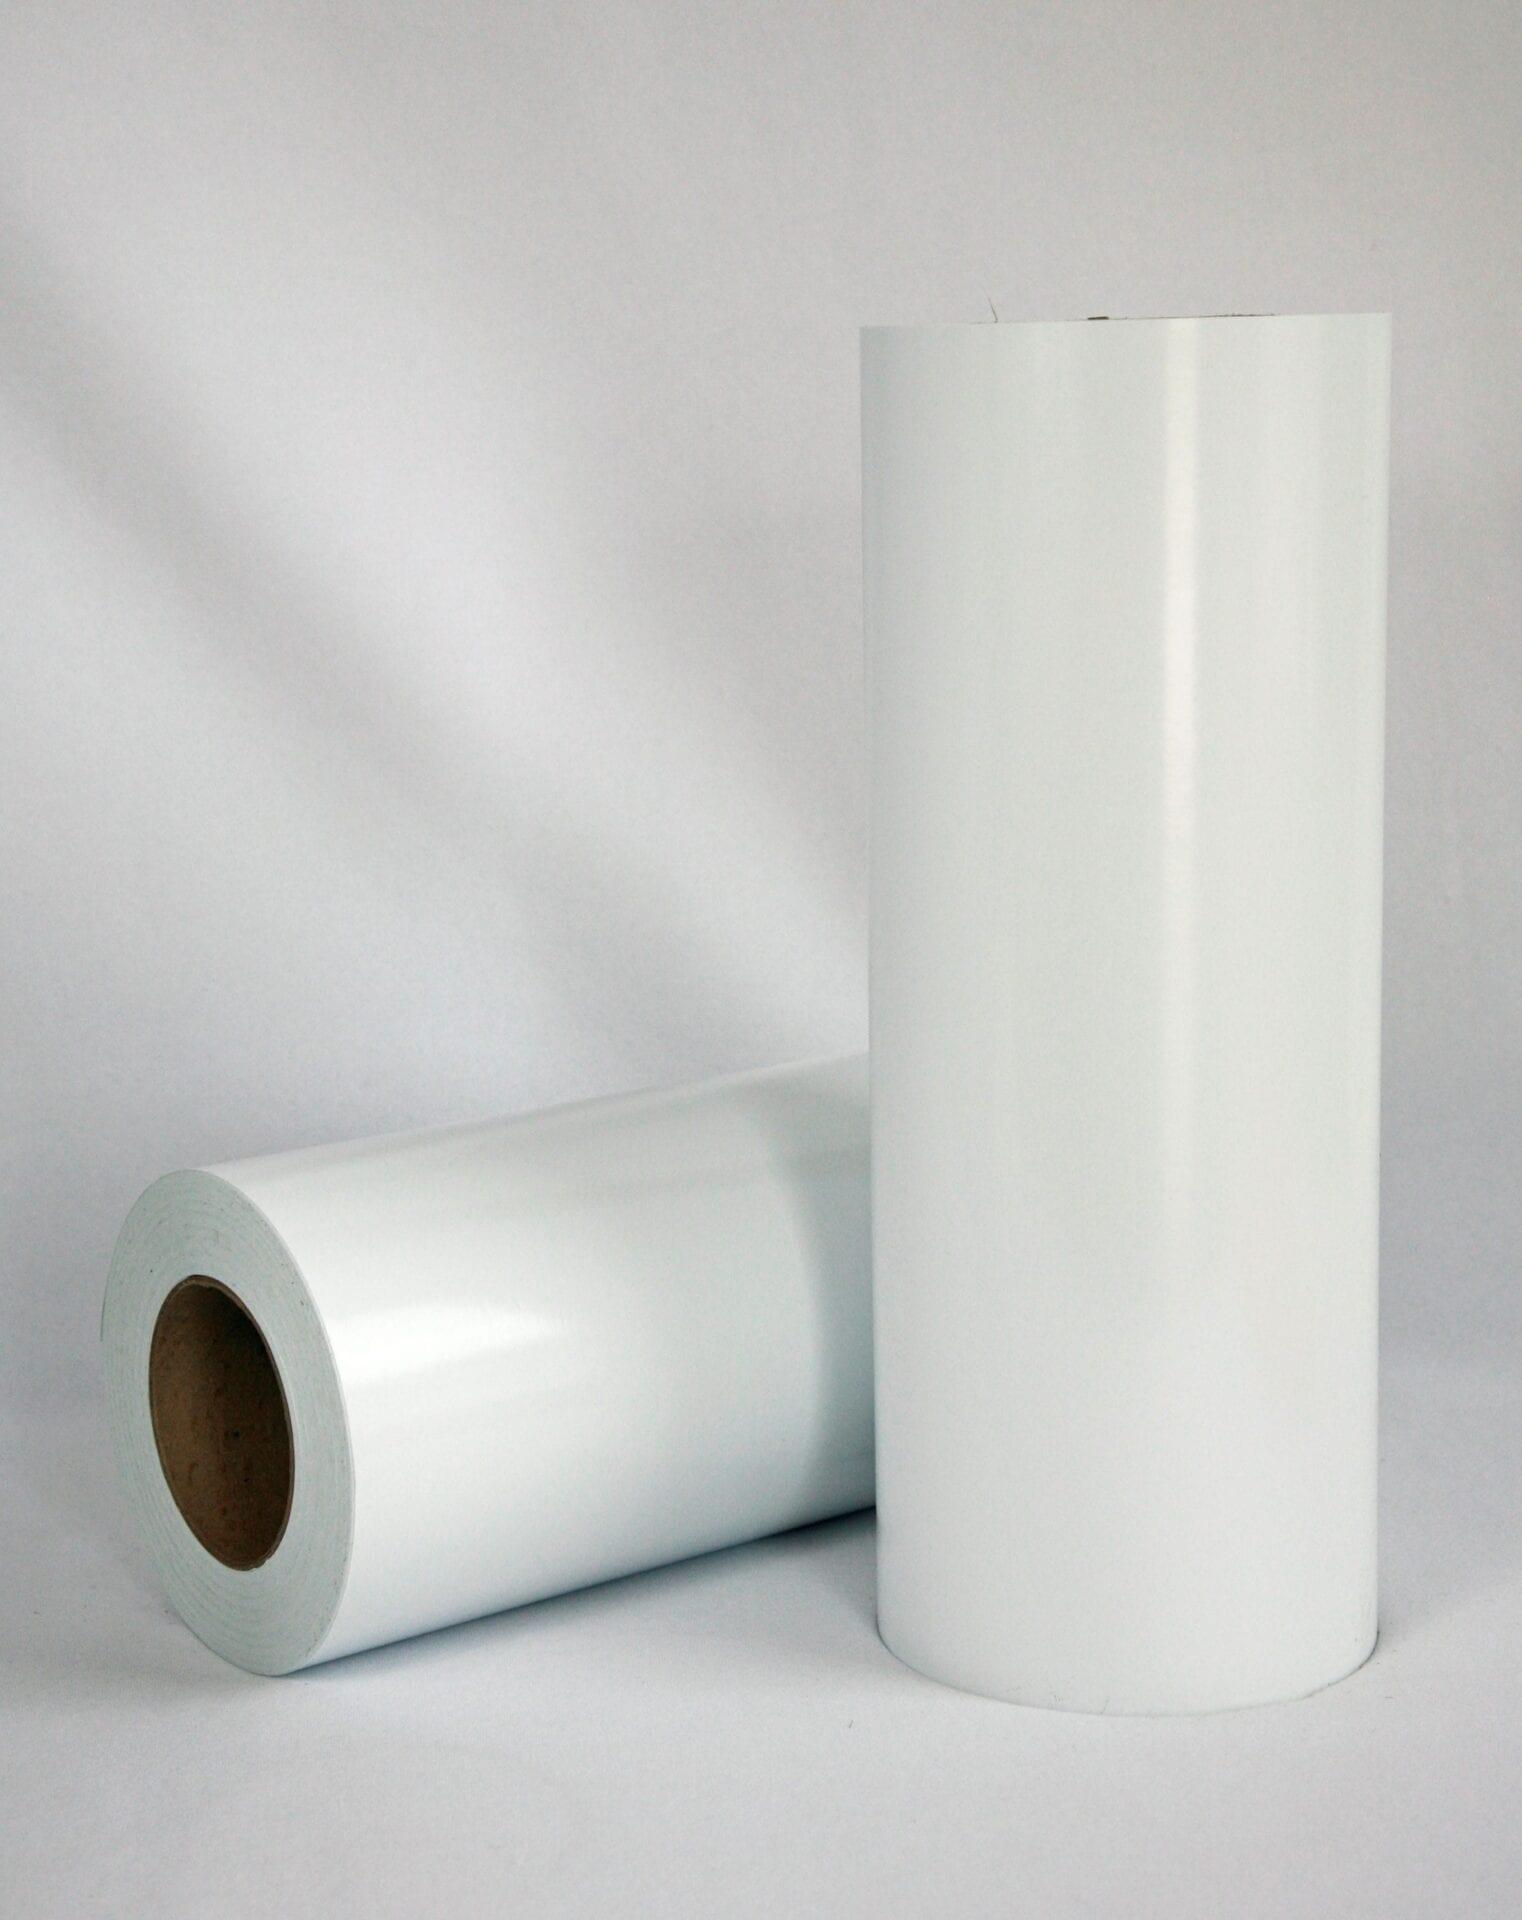 premium, reusable stencil material for general-purpose 6